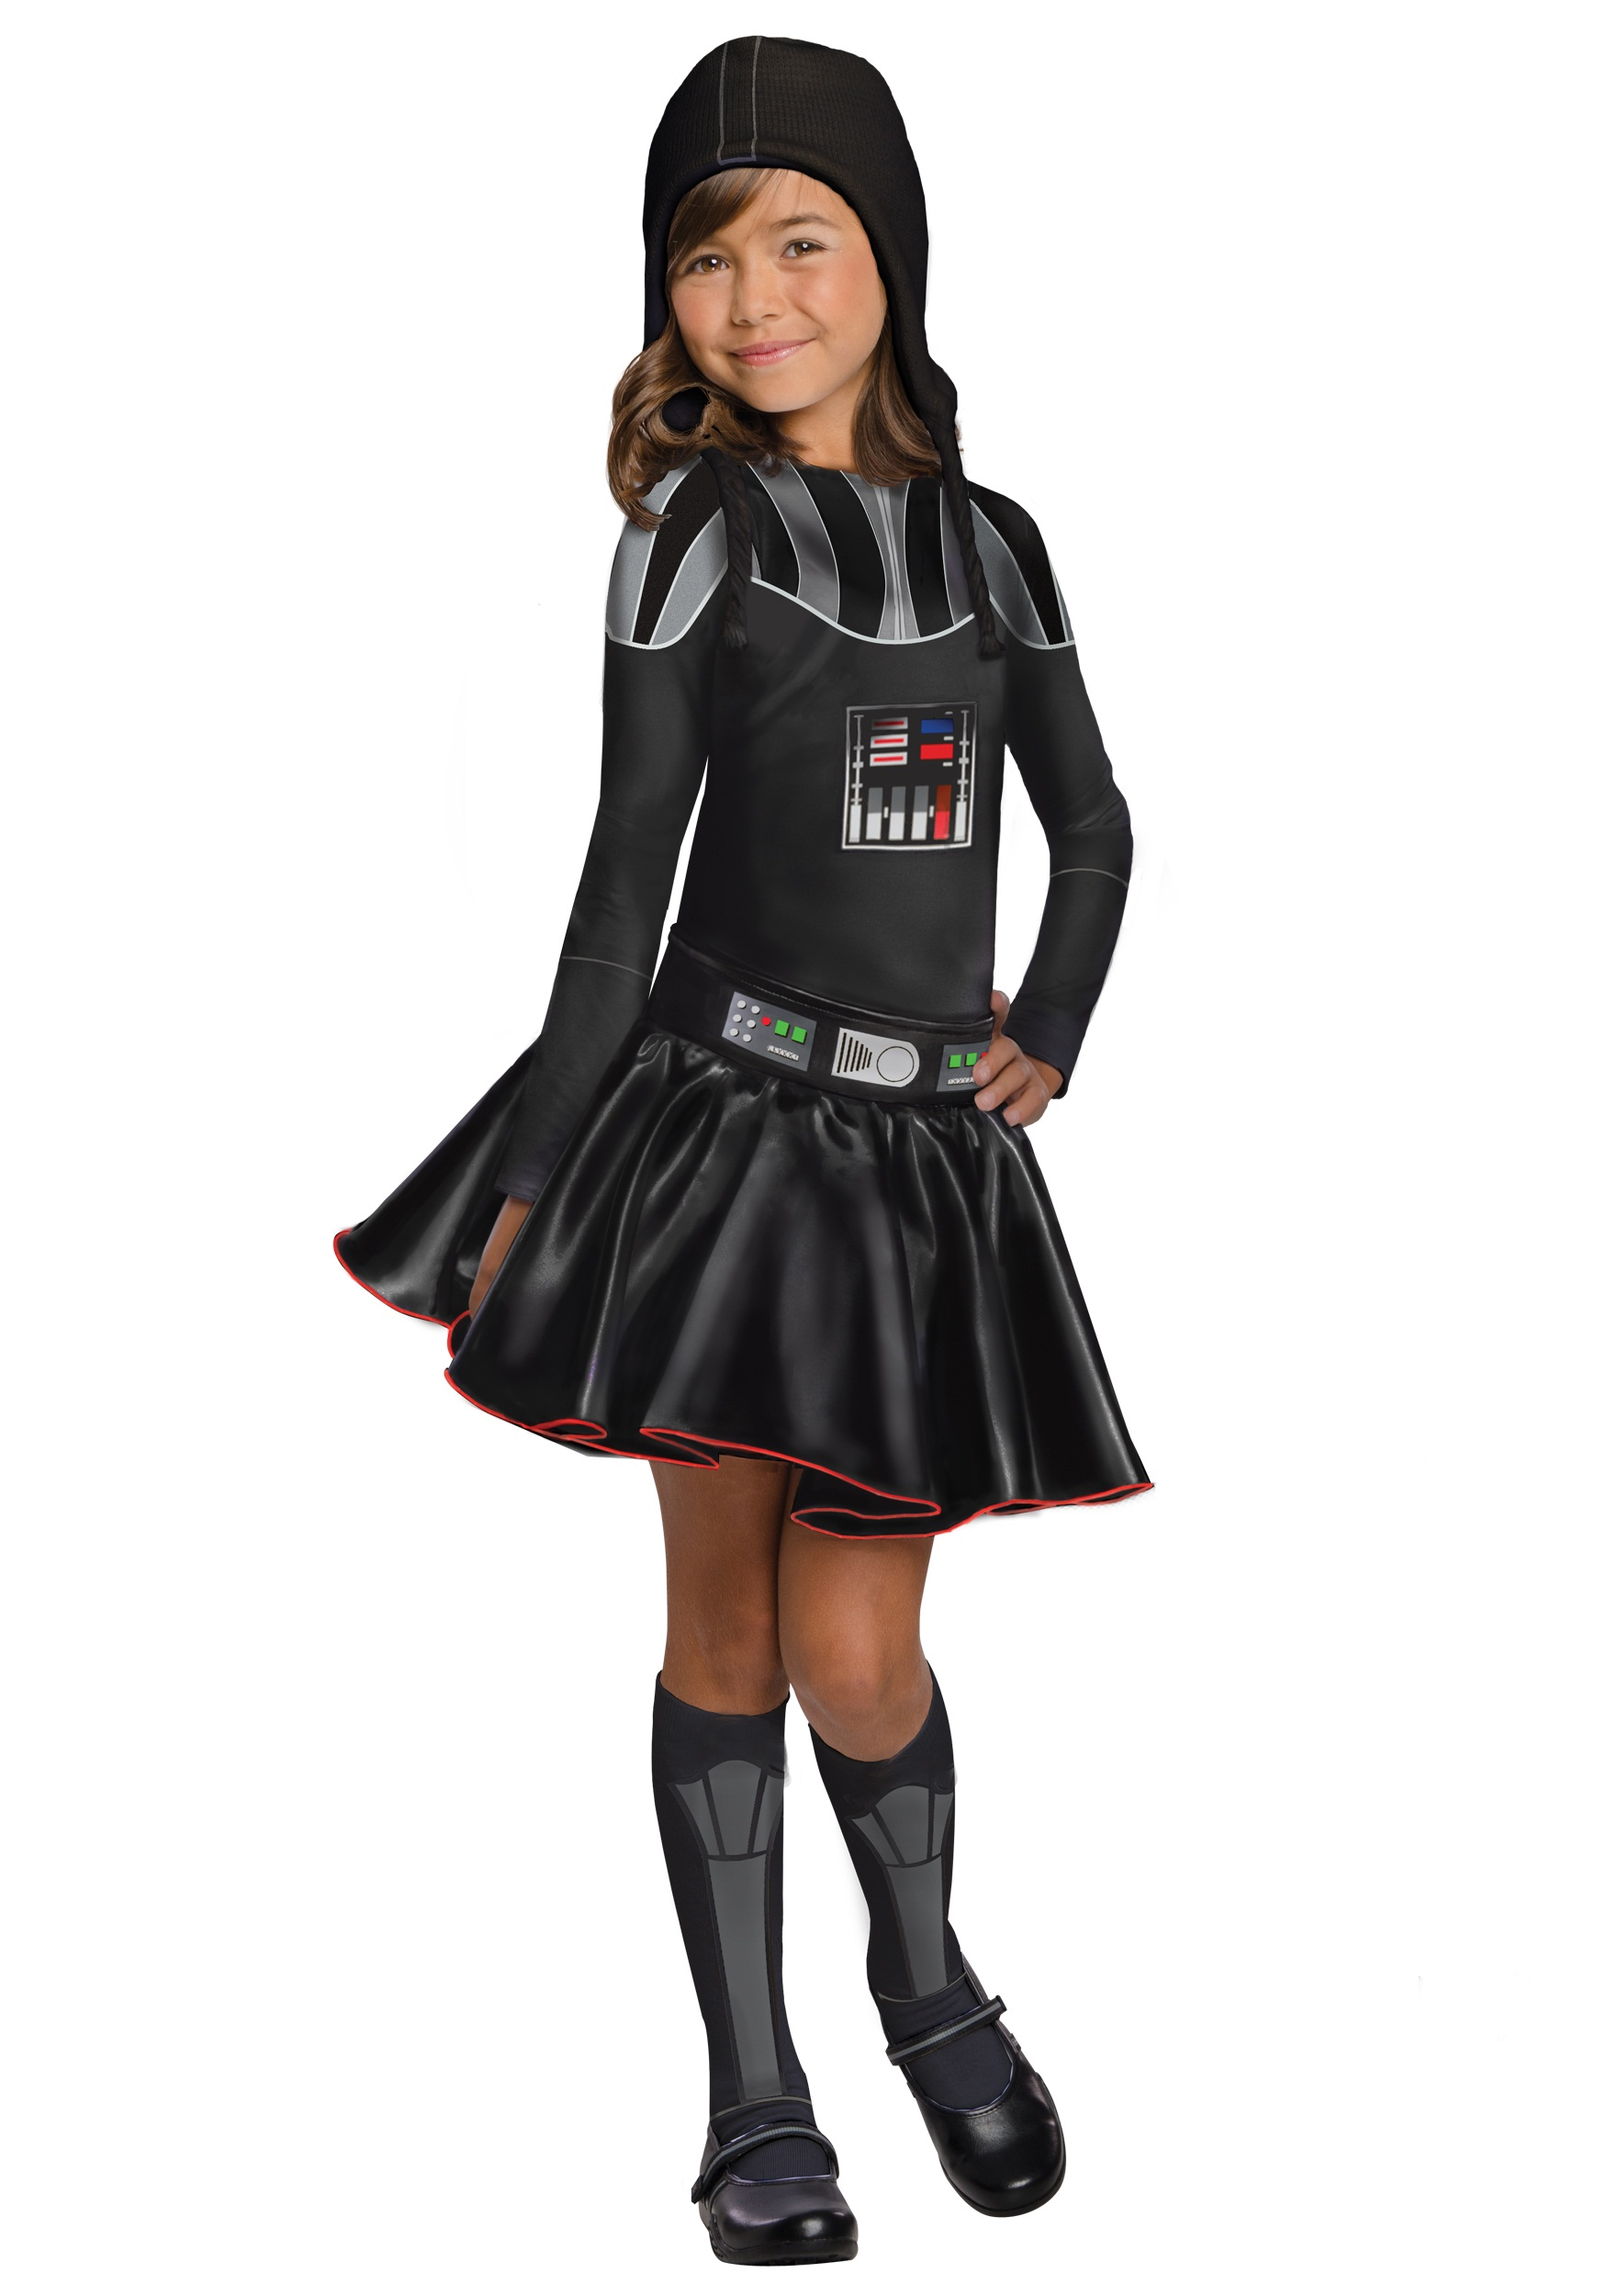 Darth Vader Costumes - Adult, Child, Kids Star Wars Halloween Costume